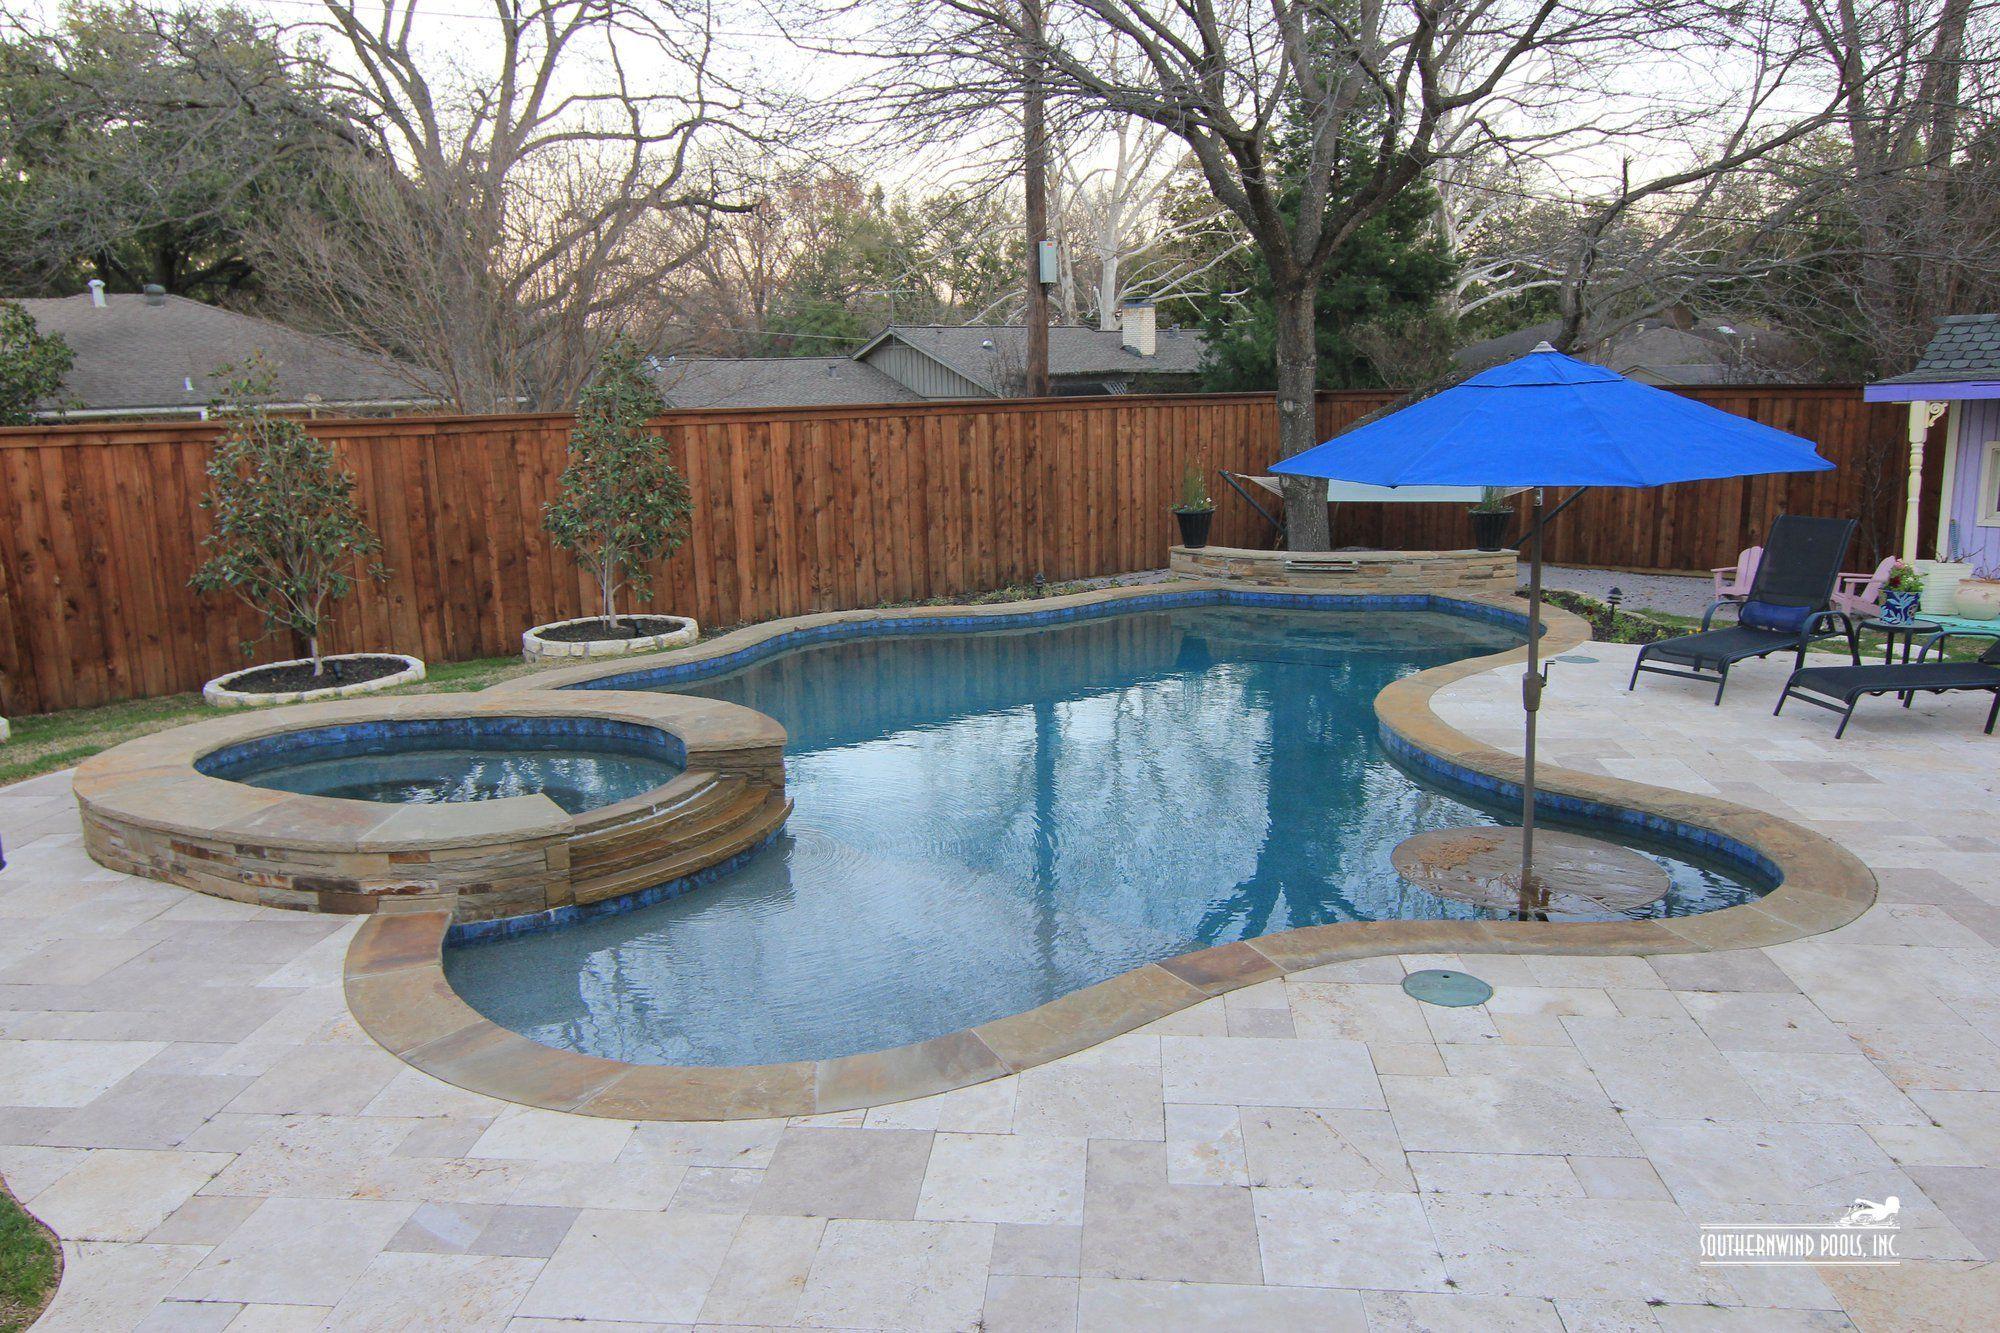 Natural Freeform Pool #123 By Southernwind Pools